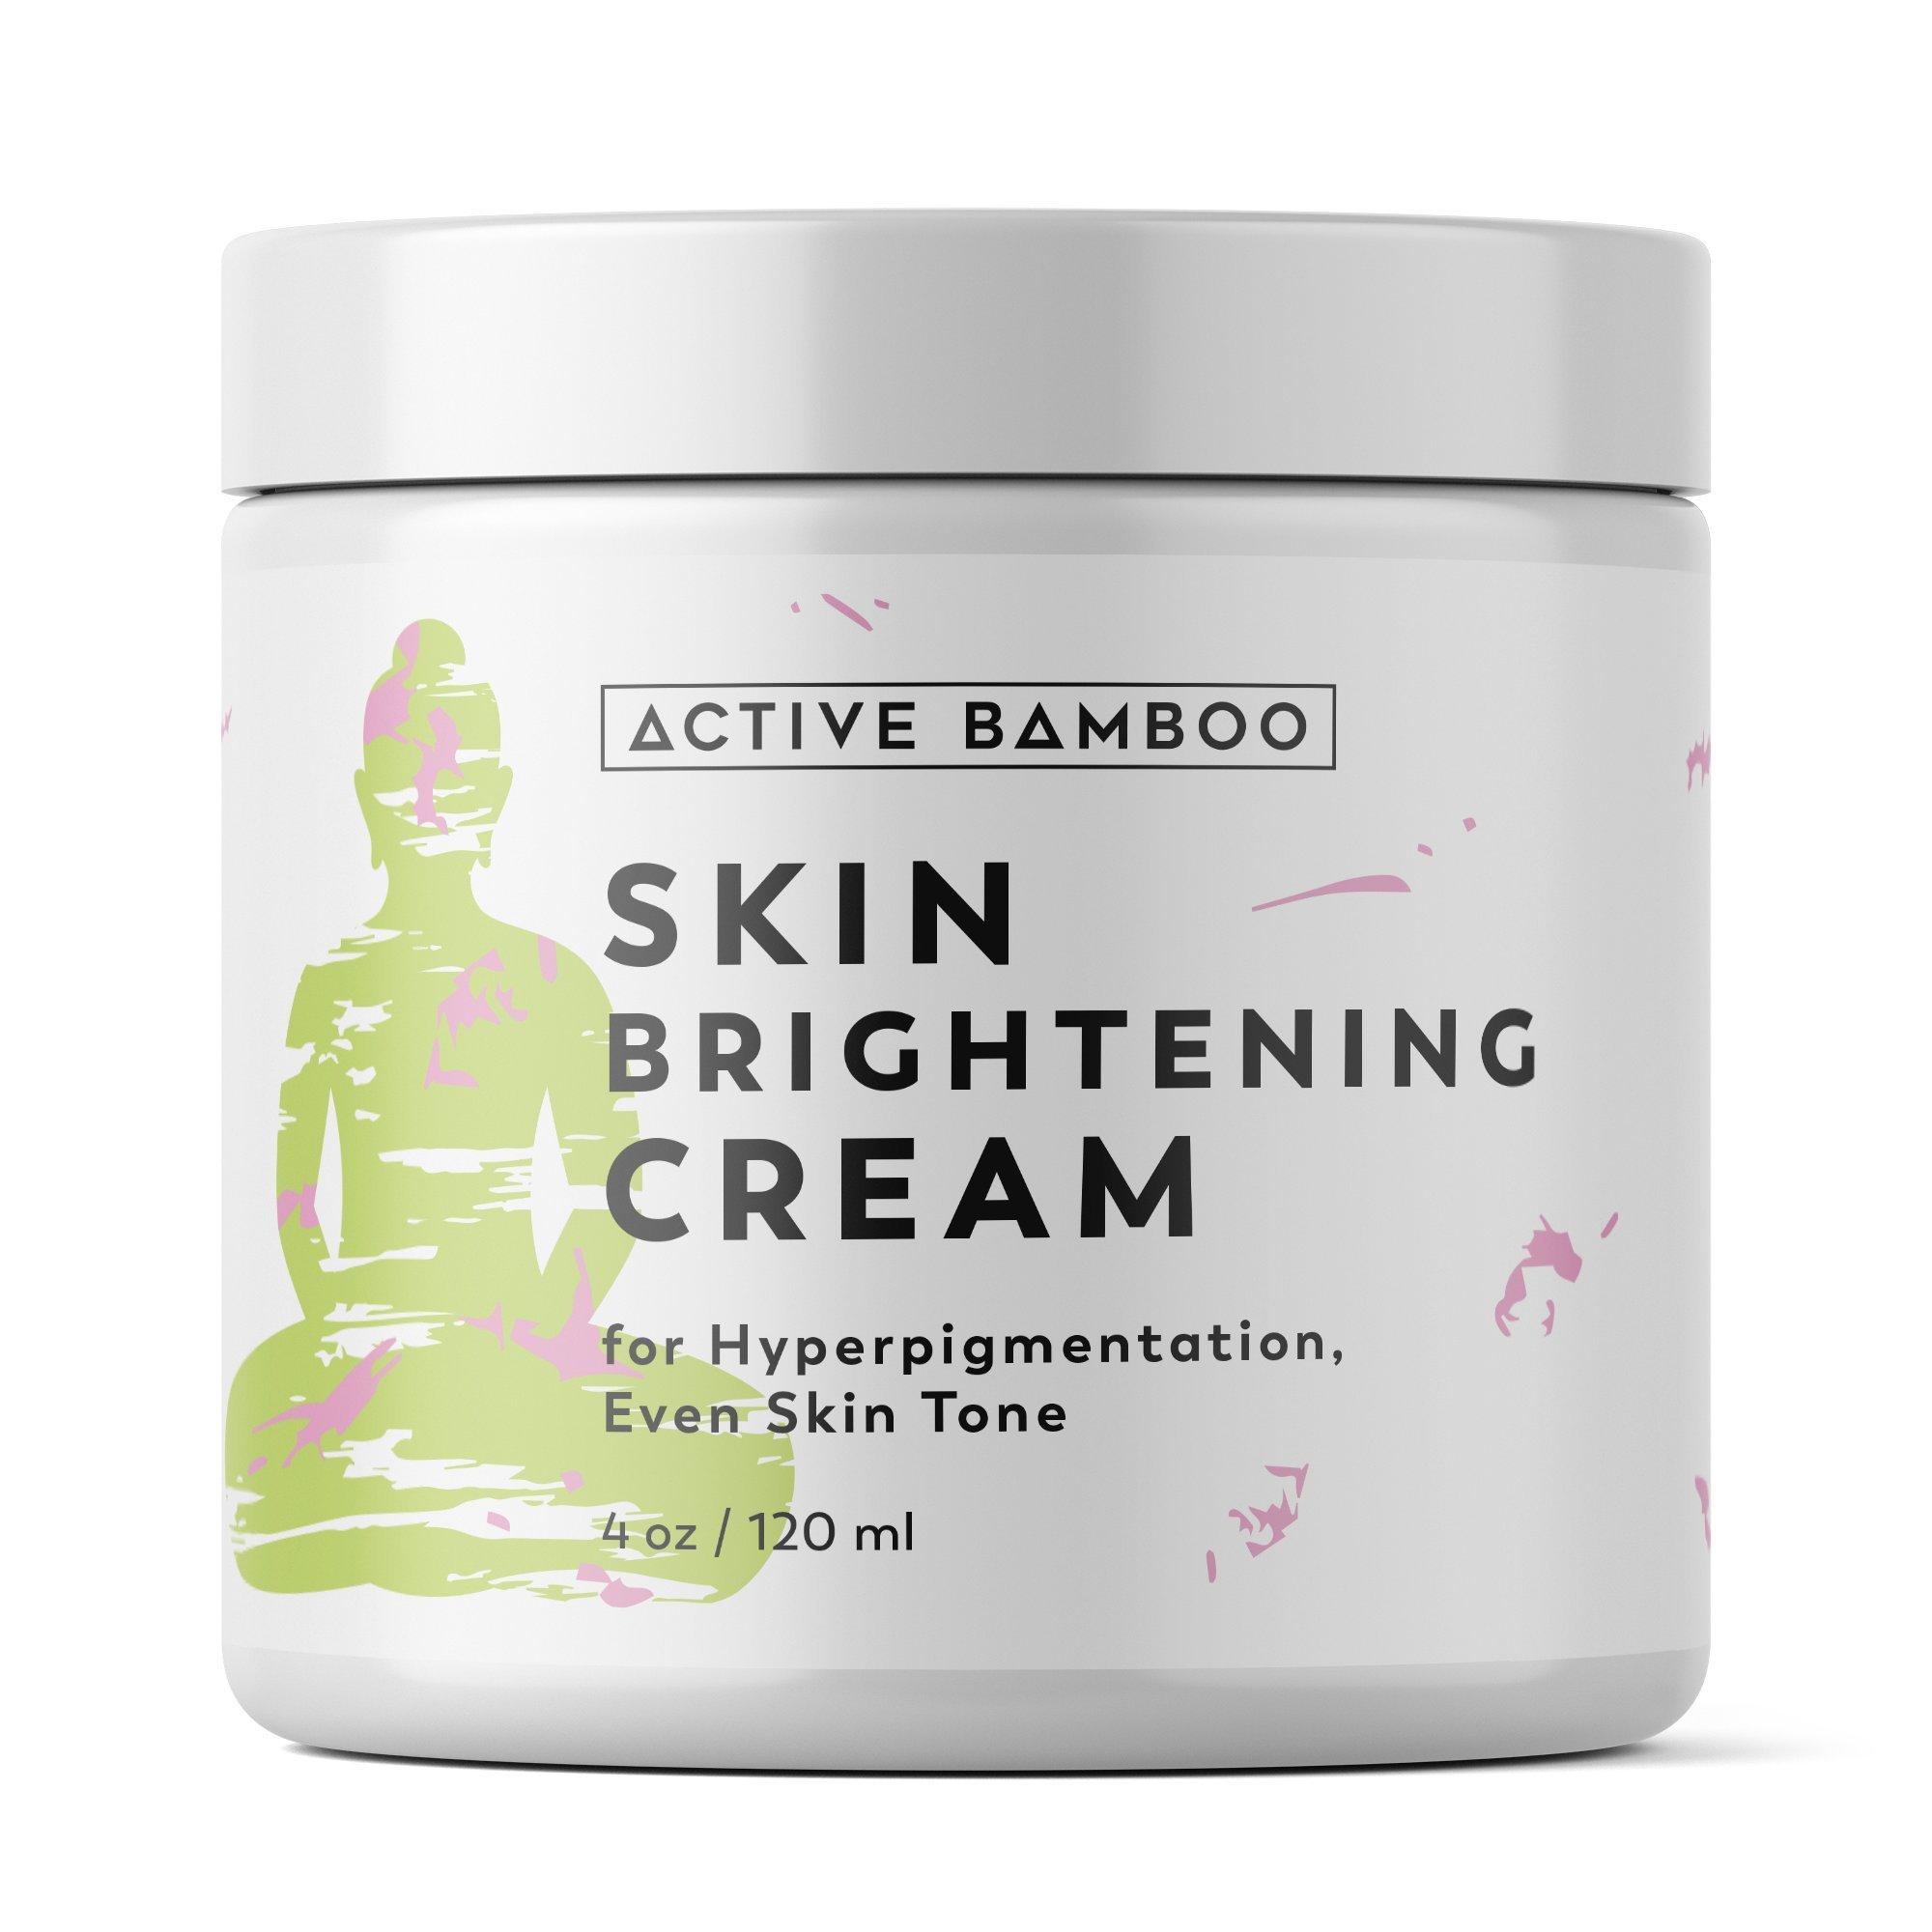 Whitening Cream. Anti Aging Skin Lightening Cream - Dark Spot Corrector Age Spot Remover for Face - Day Night Moisturizing Cream 4 OZ by Active Bamboo